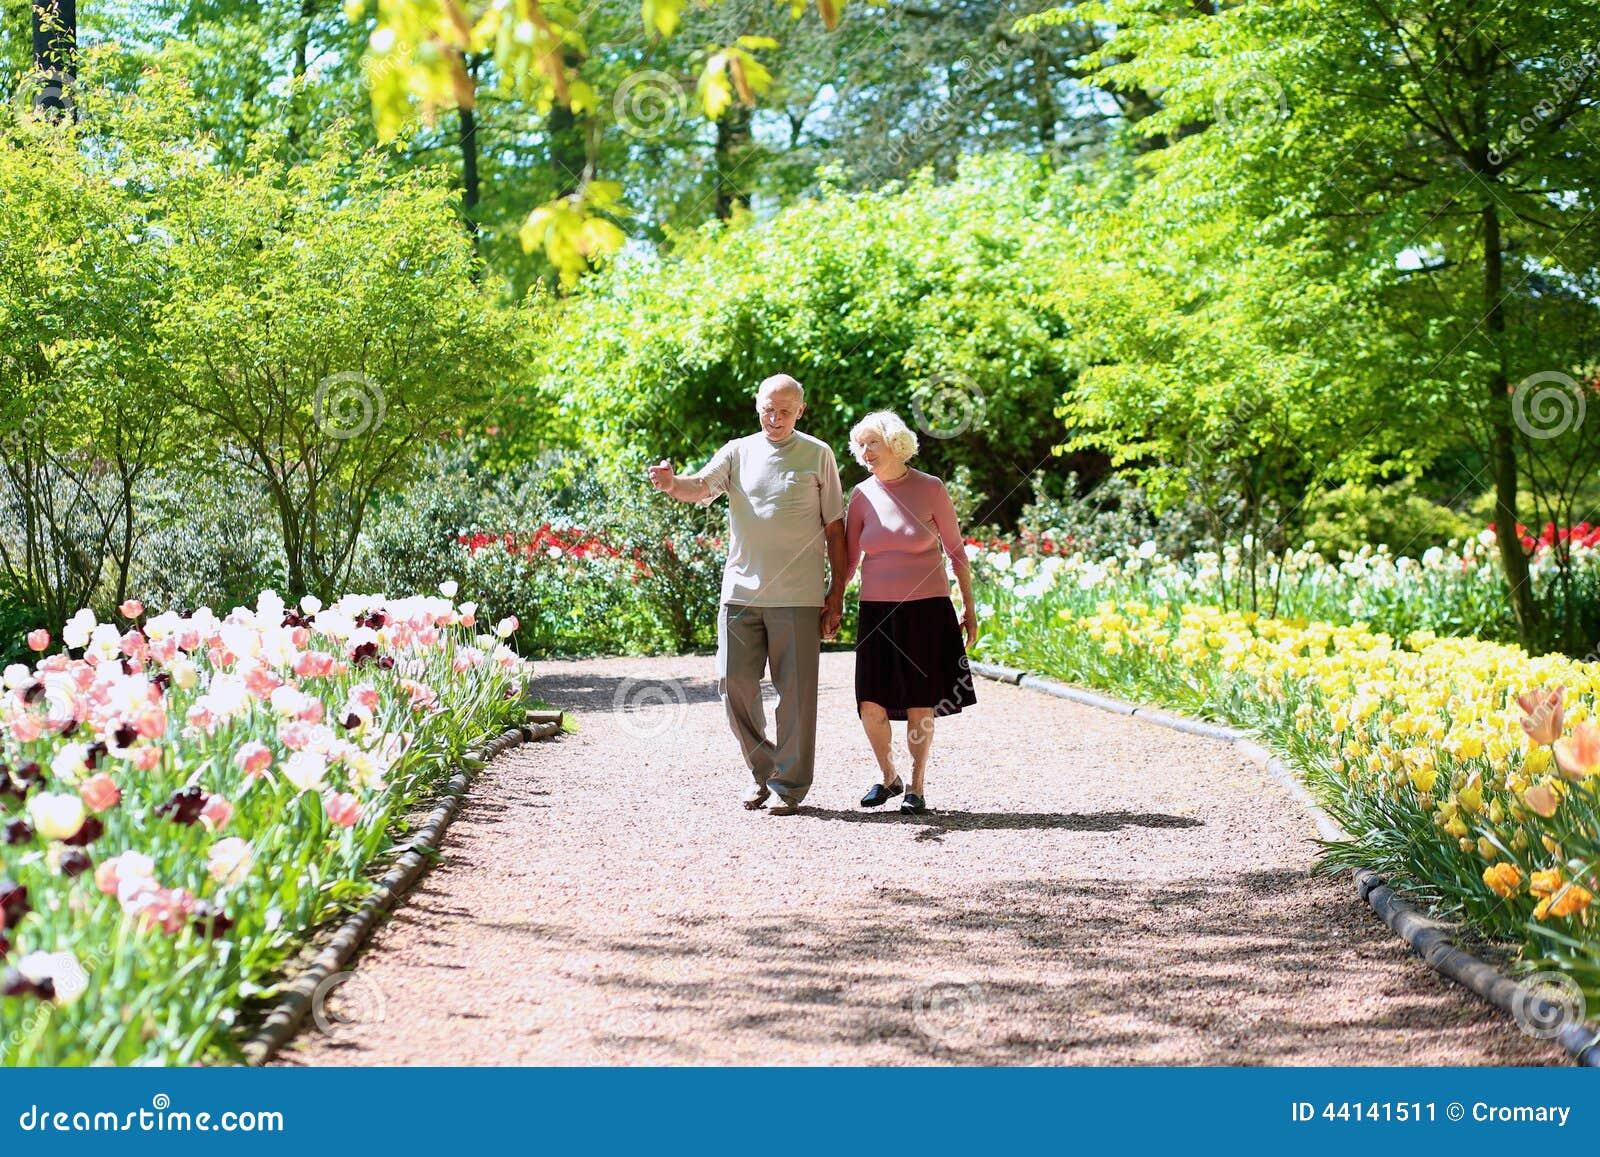 Active senior couple in beautiful flowers park